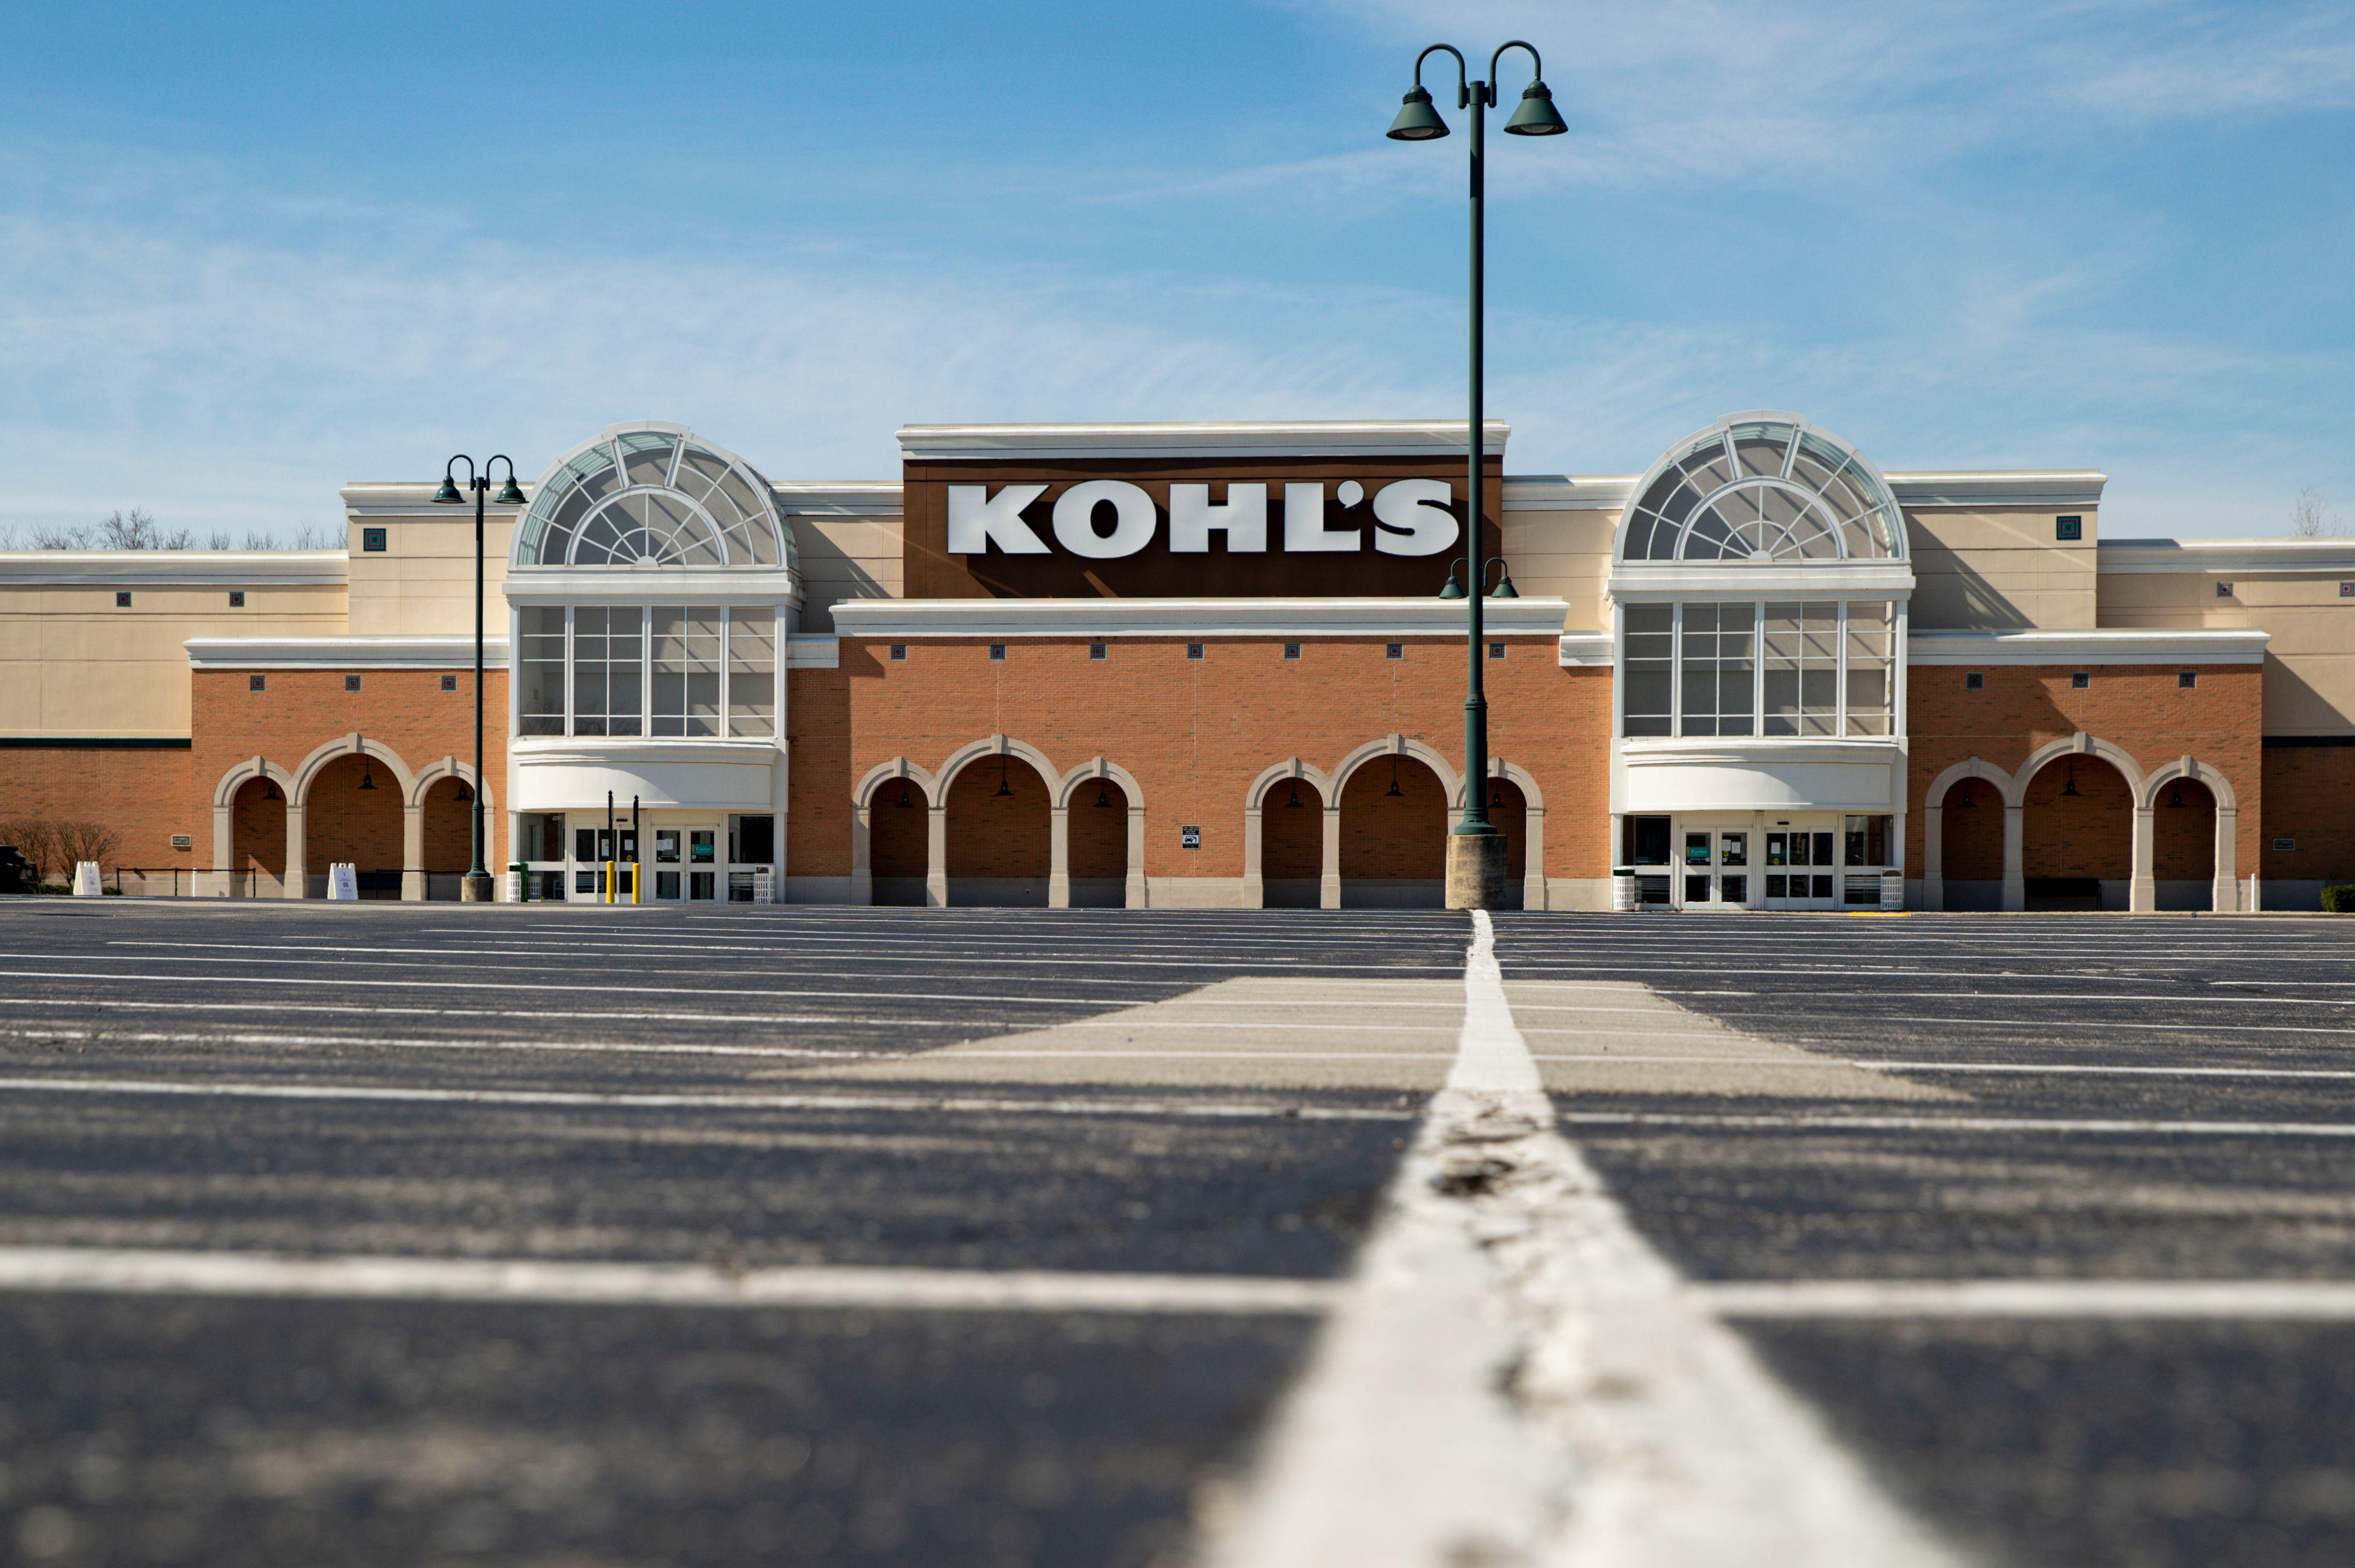 kohl's store empty parking lot coronavirus